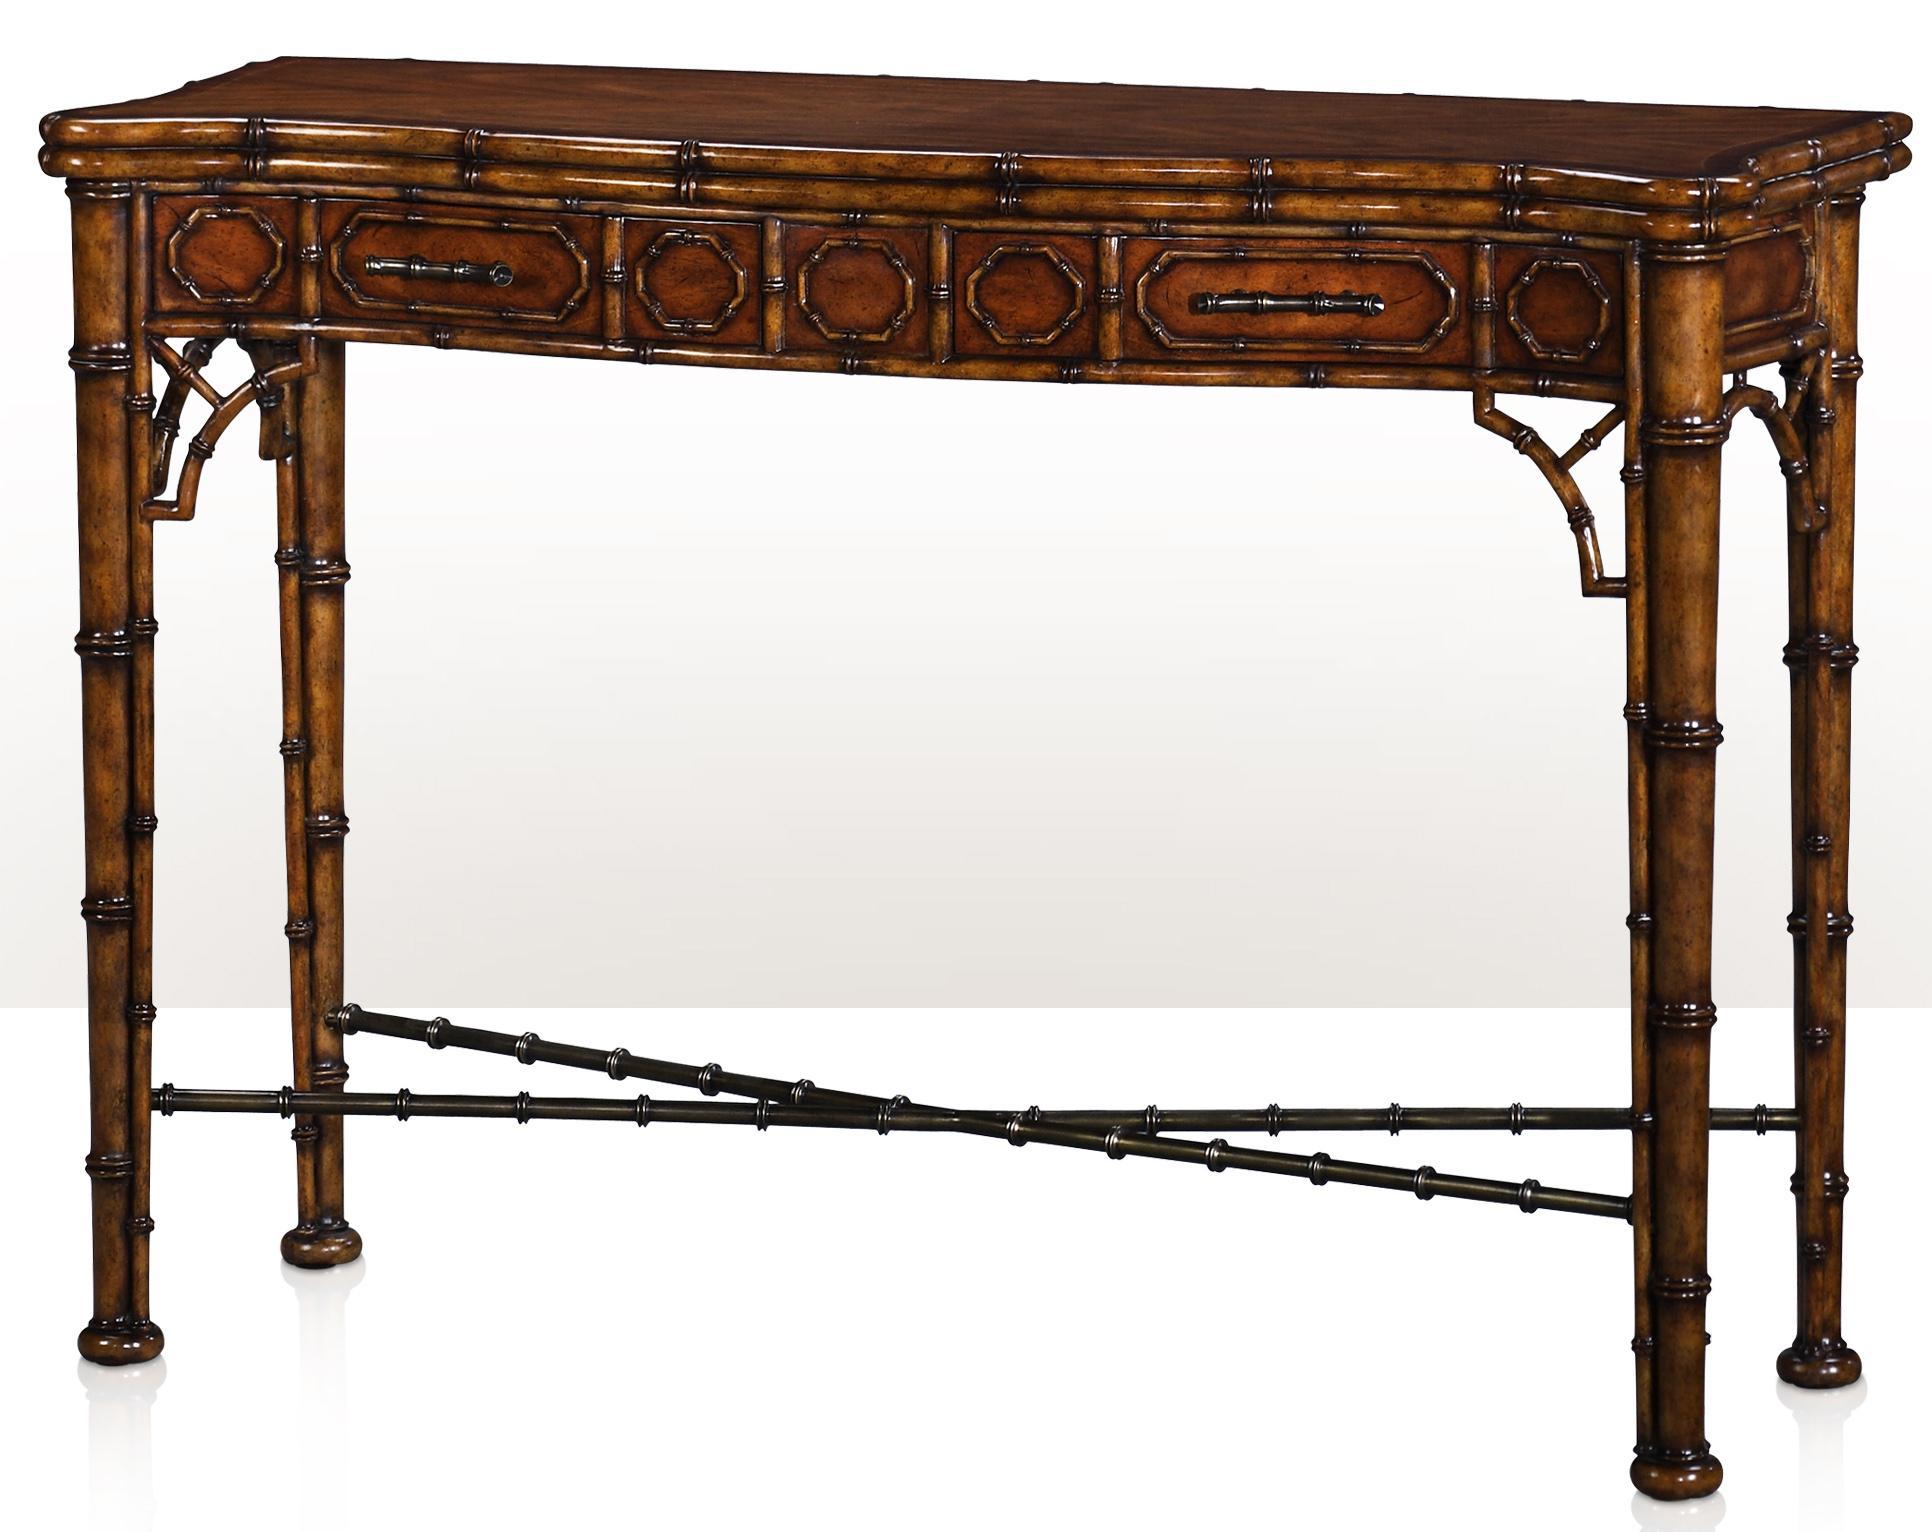 hancock moore chairs shower walmart theodore alexander indochine 5300-138 the edwardian bamboo console | baer's furniture sofa ...